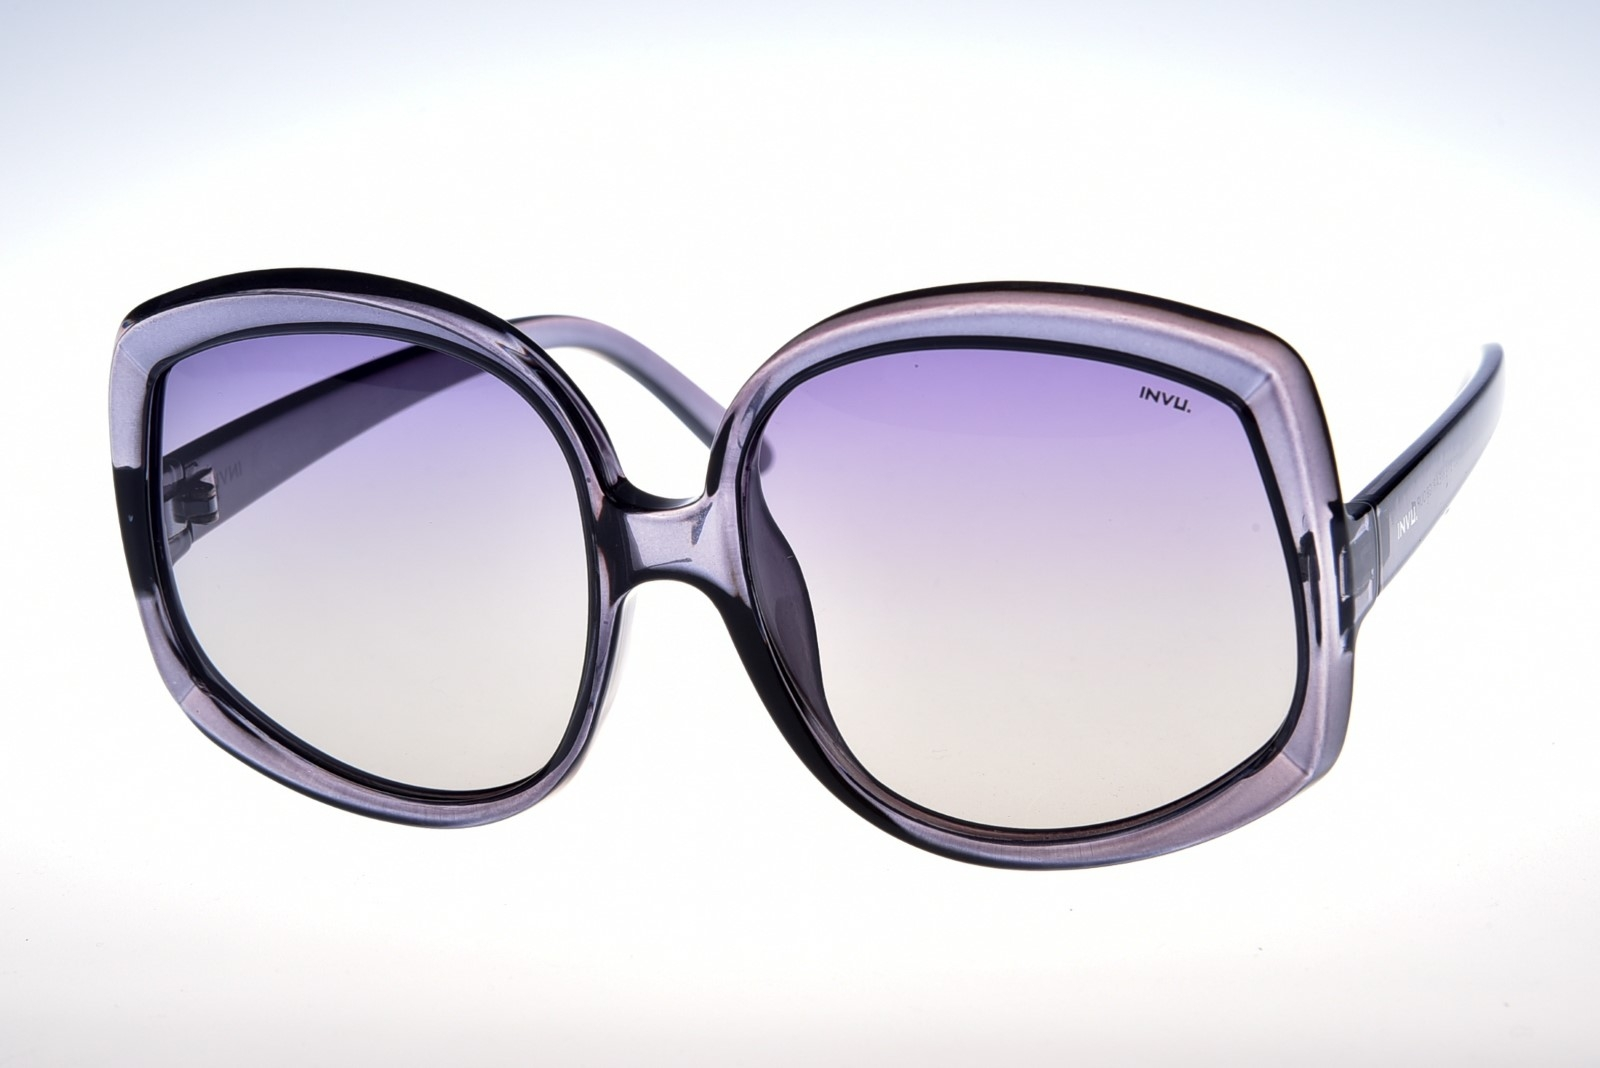 INVU. Trend T2003C - Dámske slnečné okuliare